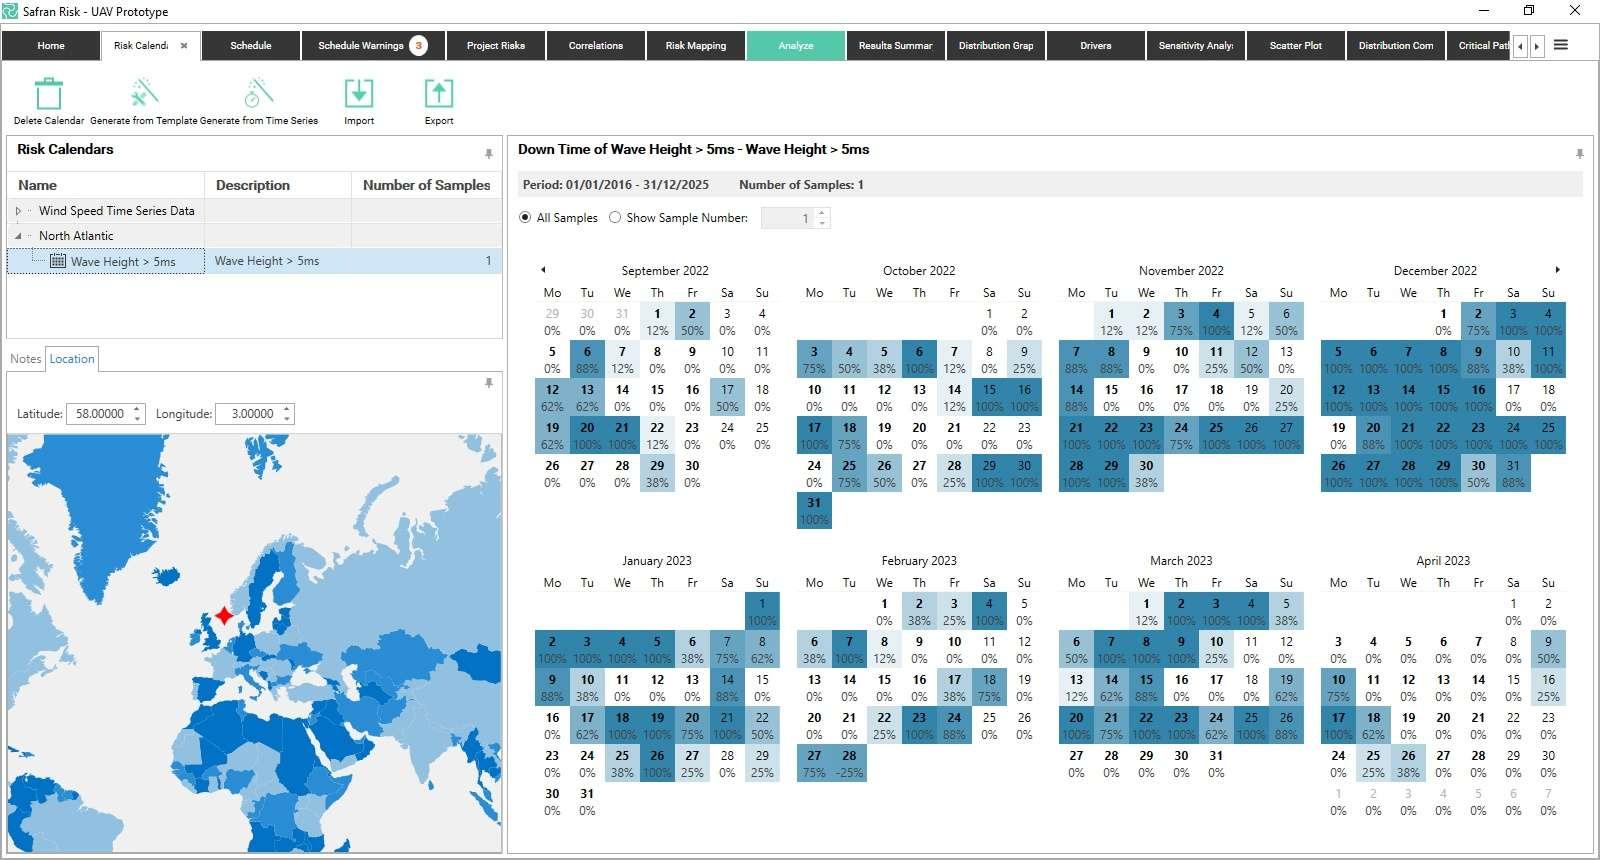 Risk calendars